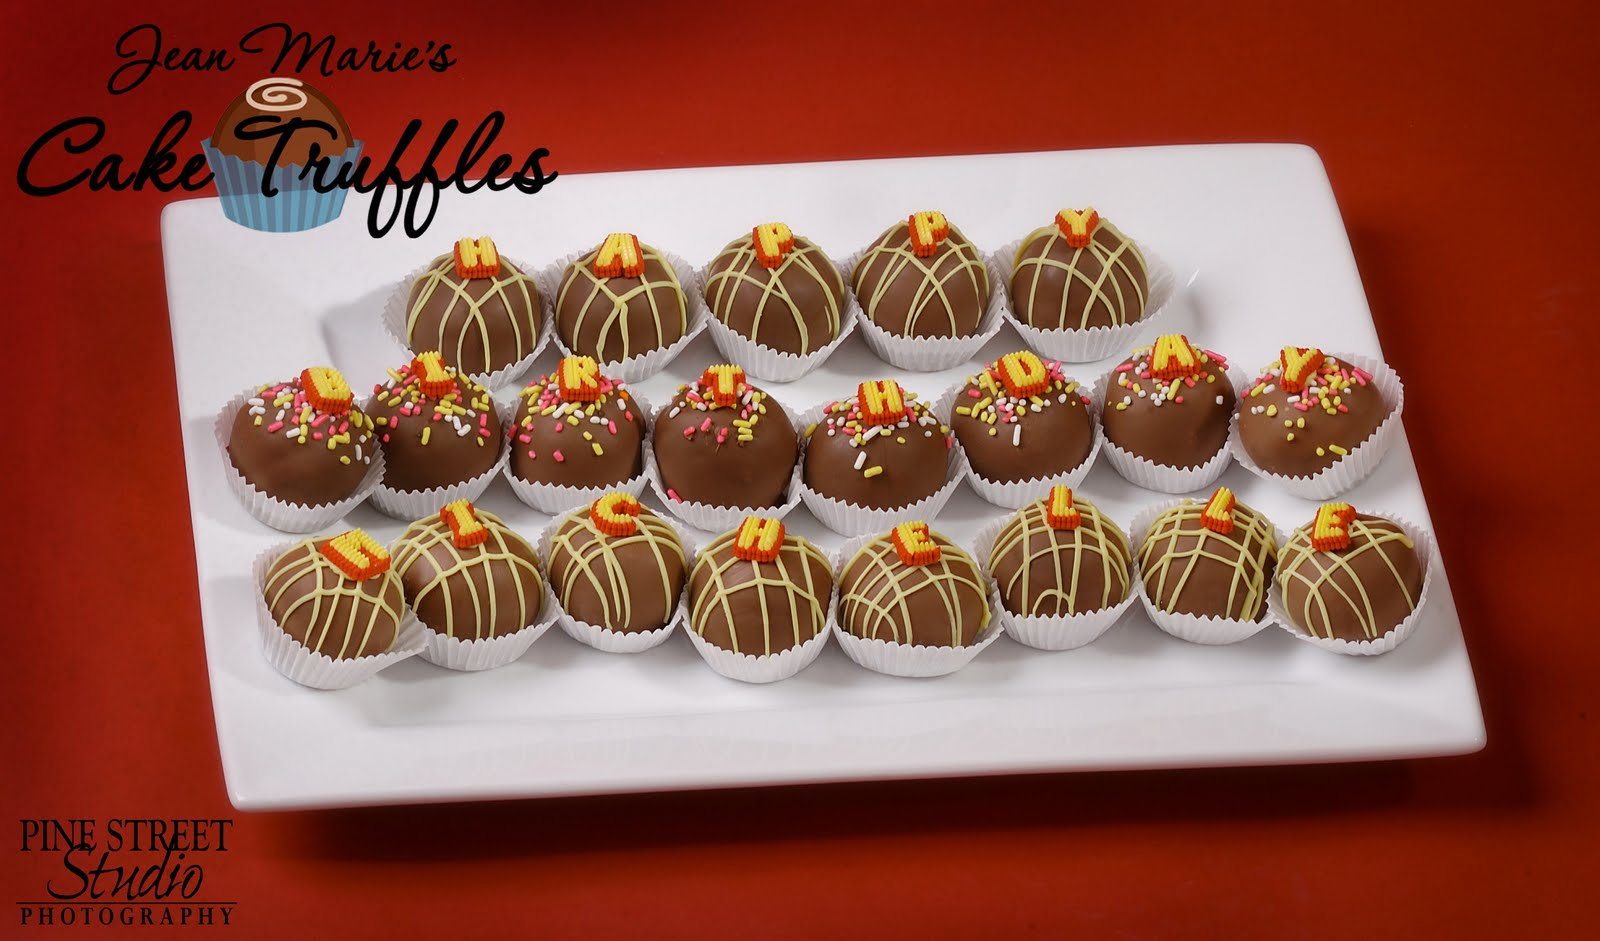 Jean Maries Cakery Happy Birthday Cake Truffles